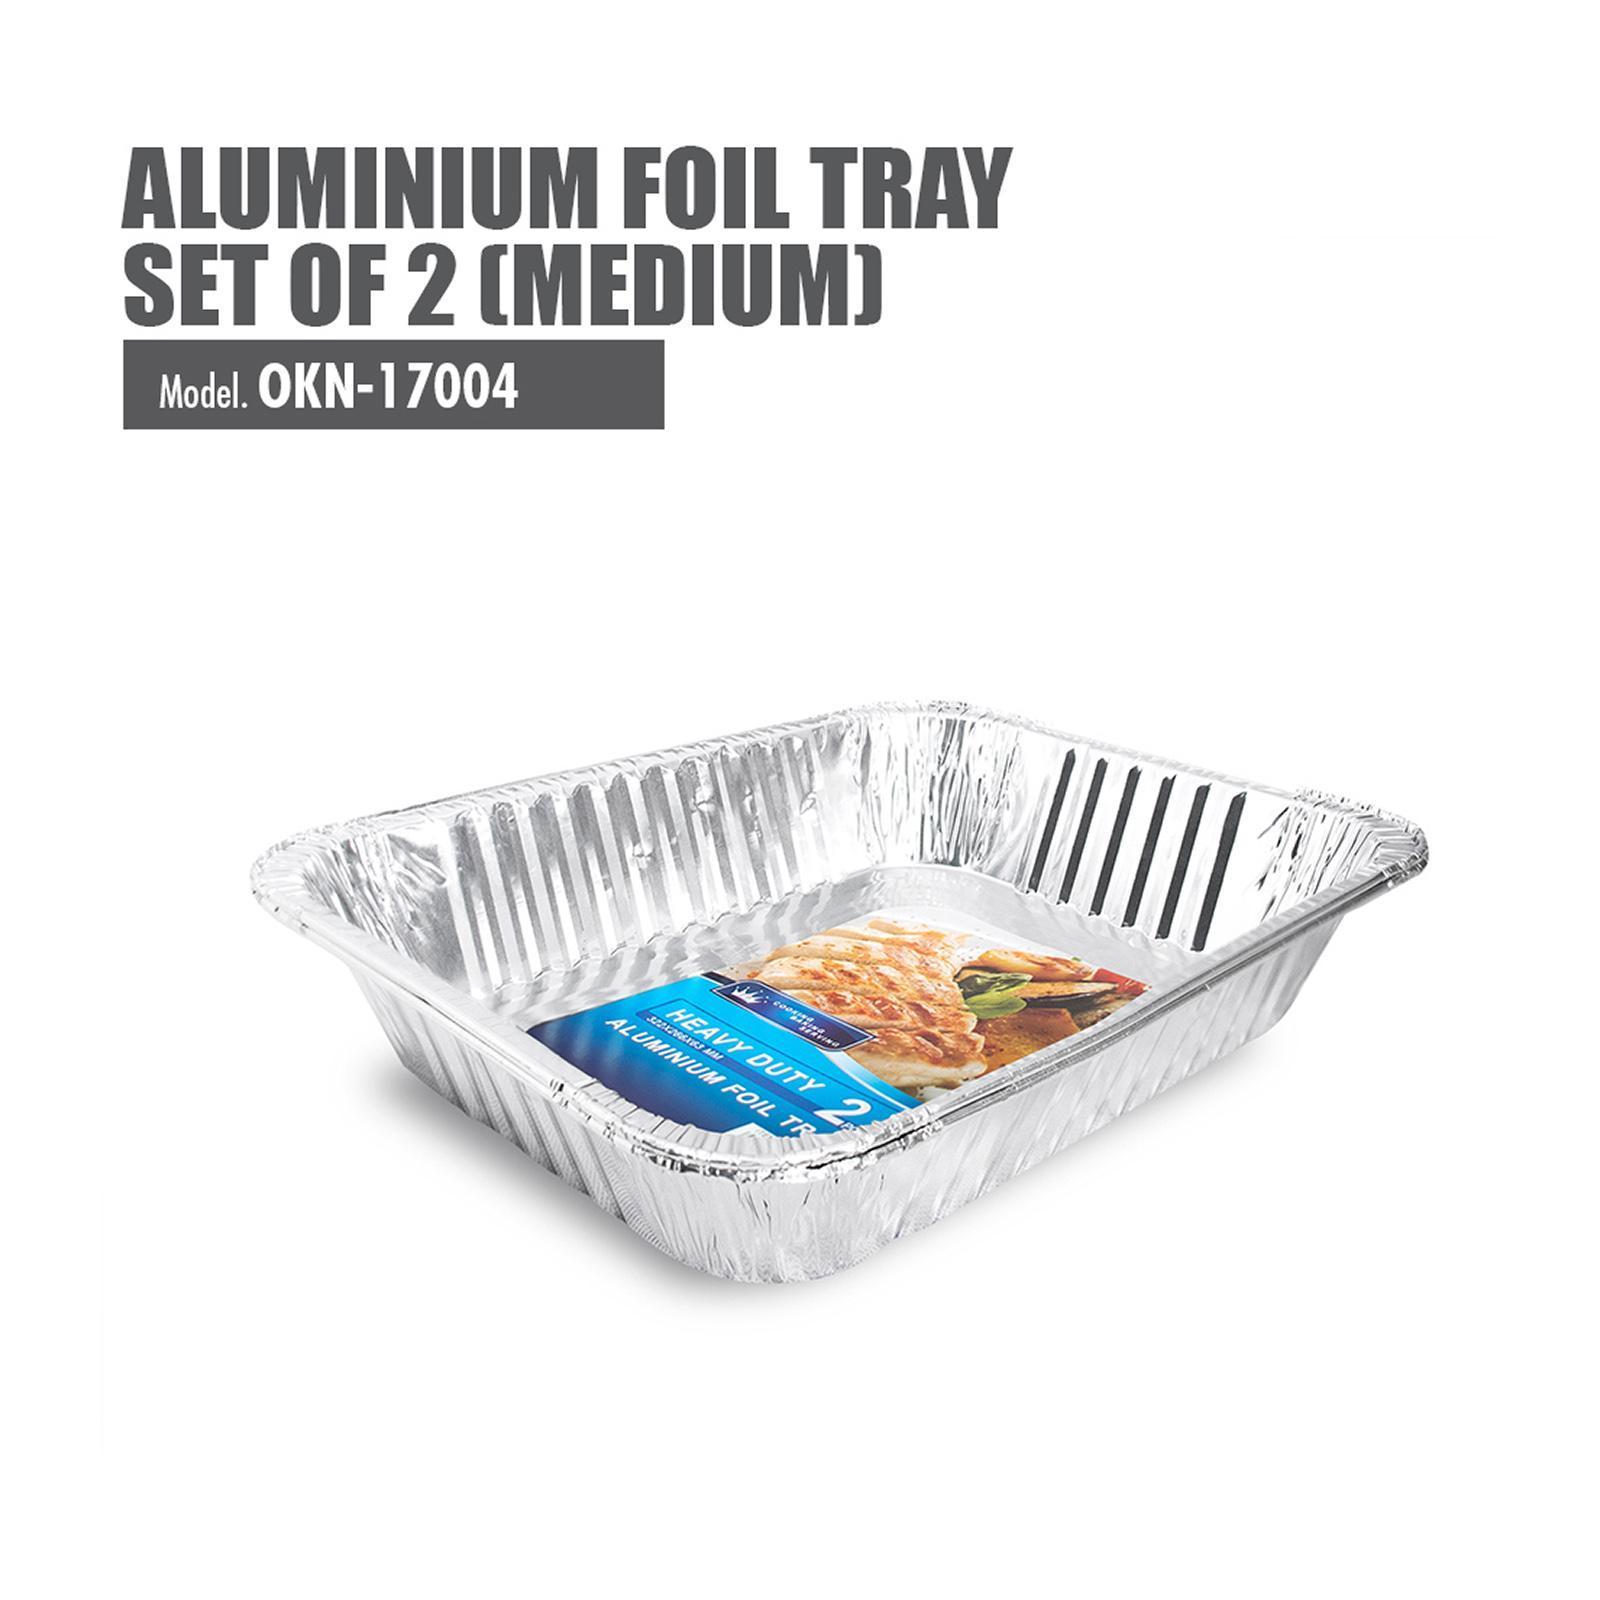 HOUZE Medium Aluminium Foil Tray (Set Of 2) - 322X266X63MM